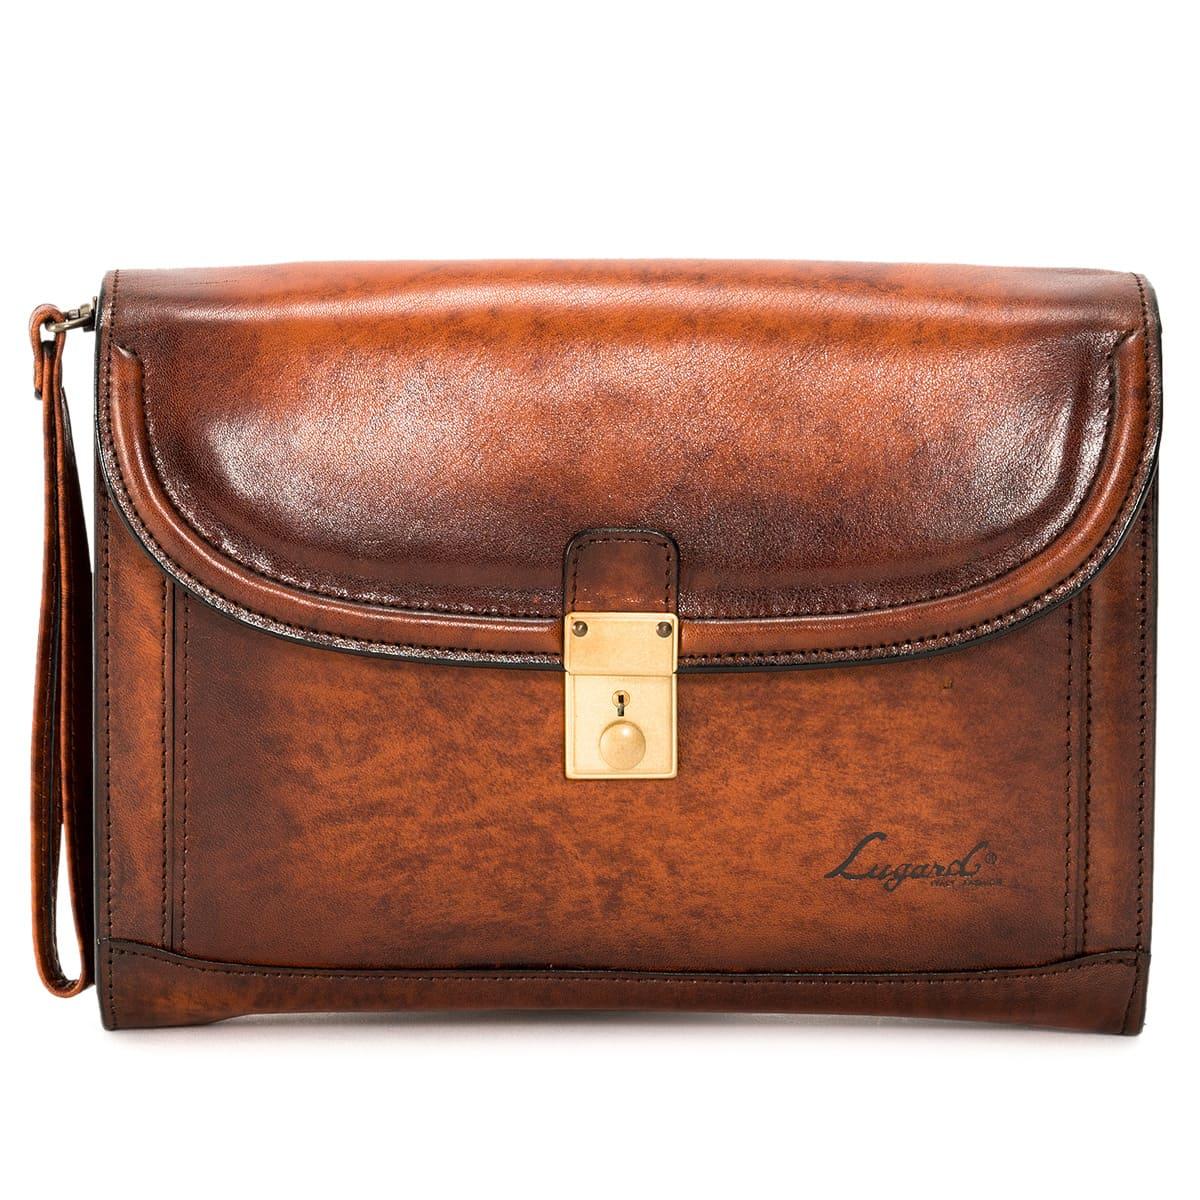 Lugard ラガード 青木鞄 バッグ クラッチバッグ セカンドバッグ G3 CLUTCH BAG メンズ ジースリー 2WAY ブラウン 5217